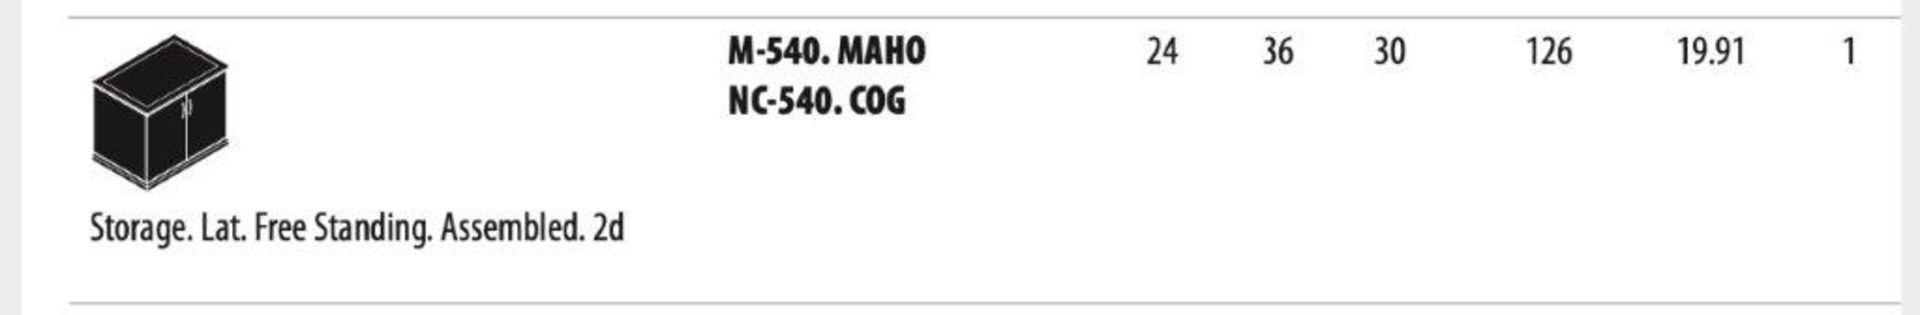 (2) Cherryman Emerald Collection Mahogany Storage Lat. Free Standing Assembled. (M540 (List price - Image 2 of 2